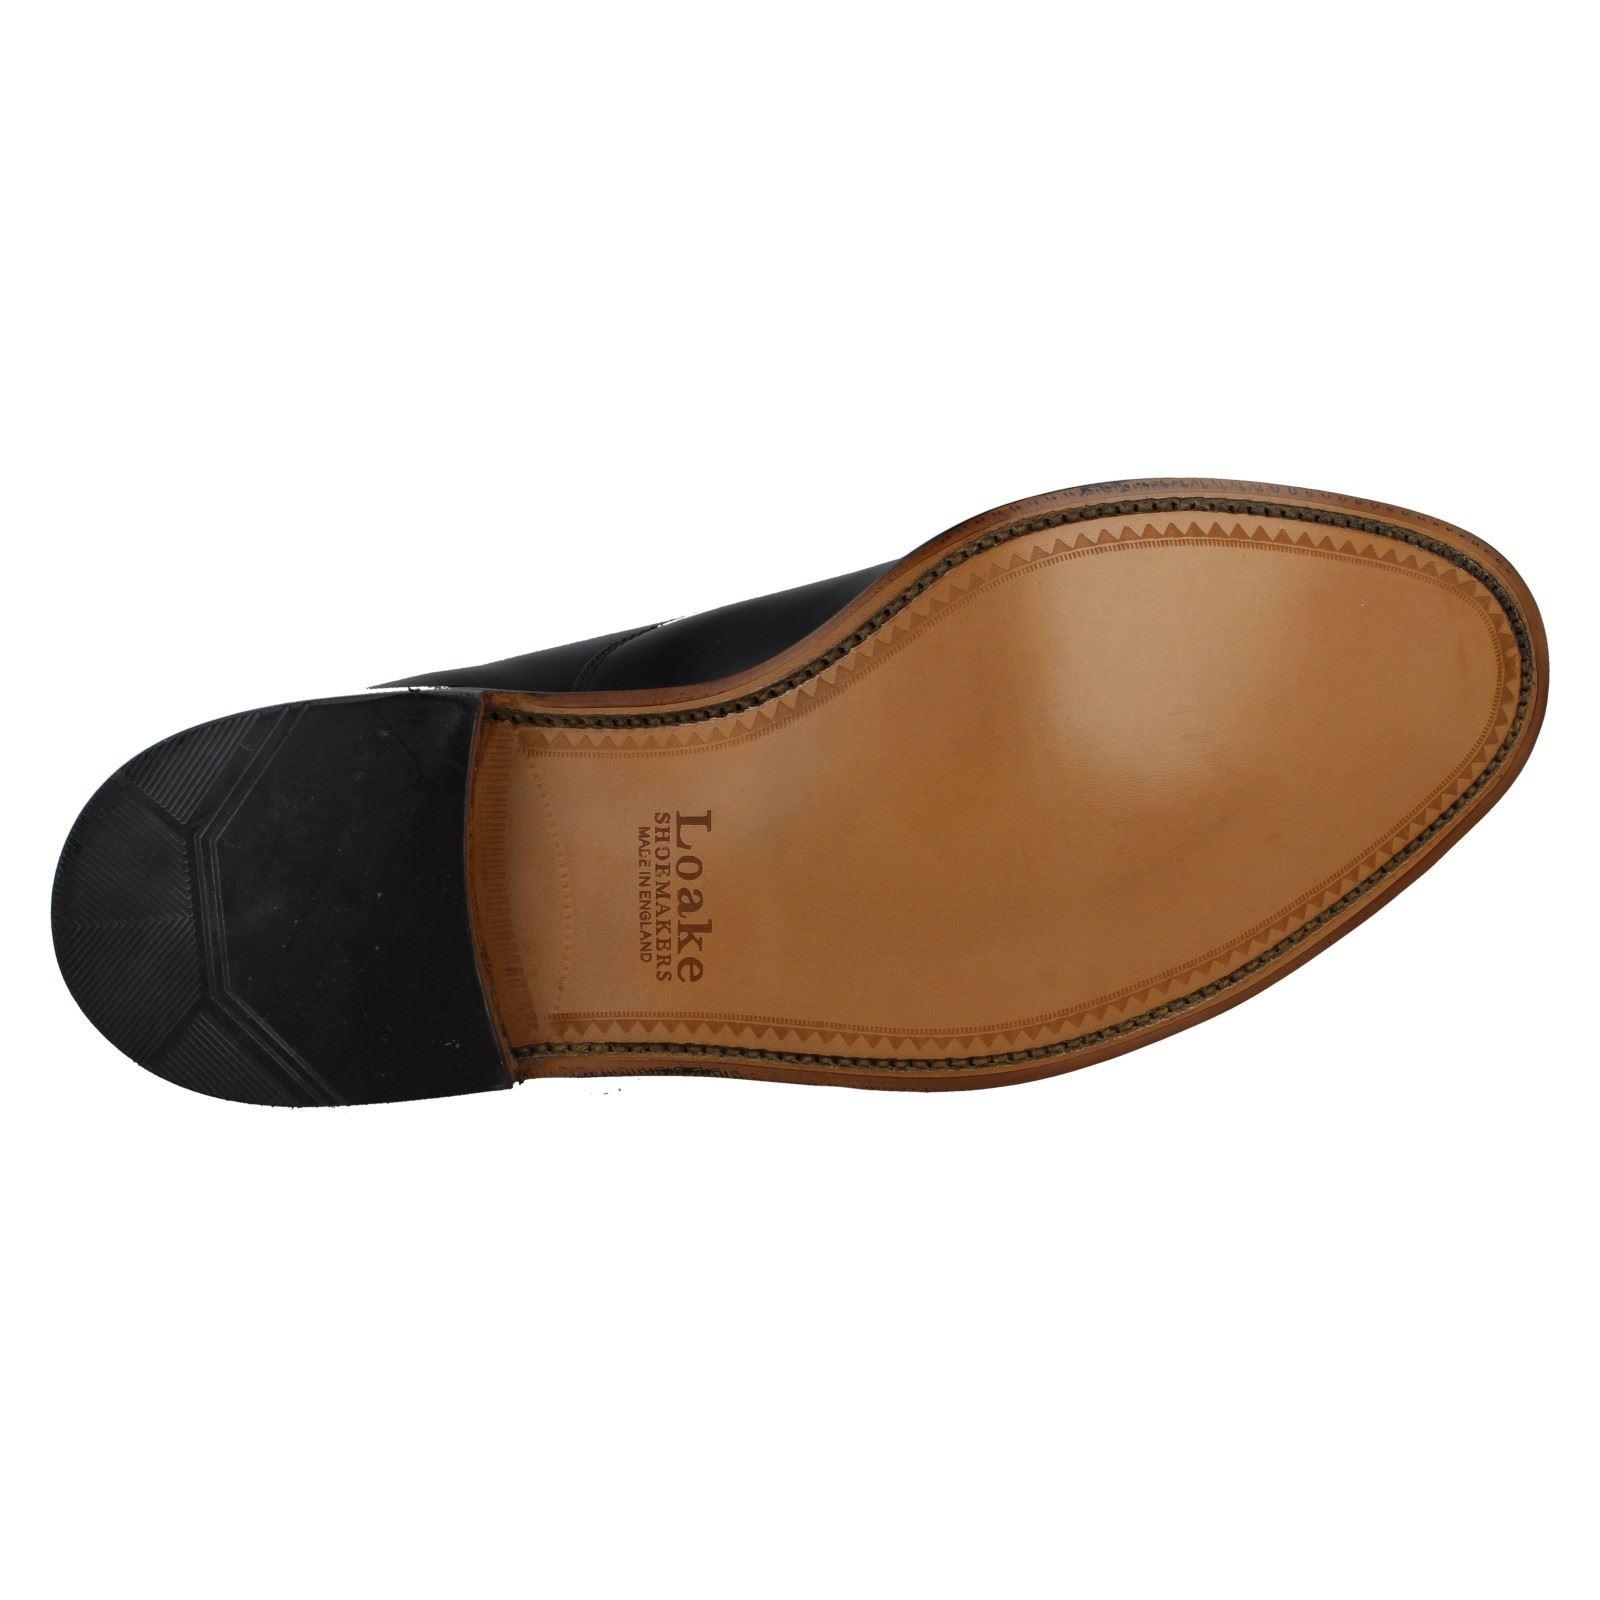 Mens Loake Elland Elland Loake Polished Leather Smart schuhe 0e77f6